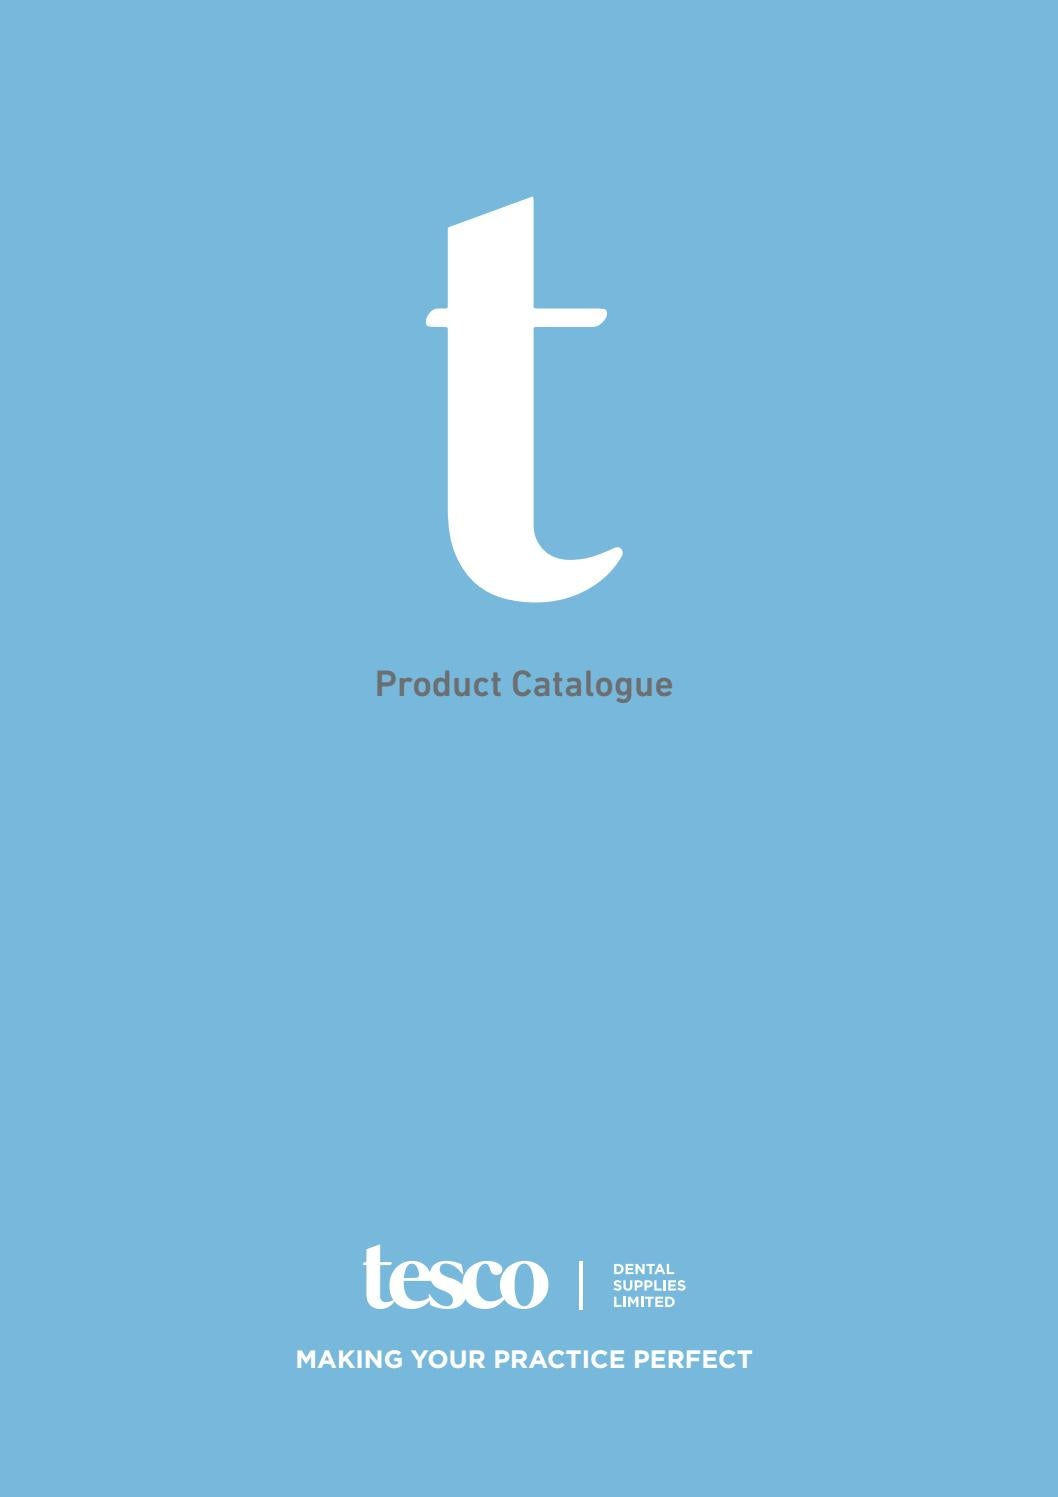 2016 Catalogue Revised On 2016 11 08 Tesco 全型錄全本的pdf電子檔 By